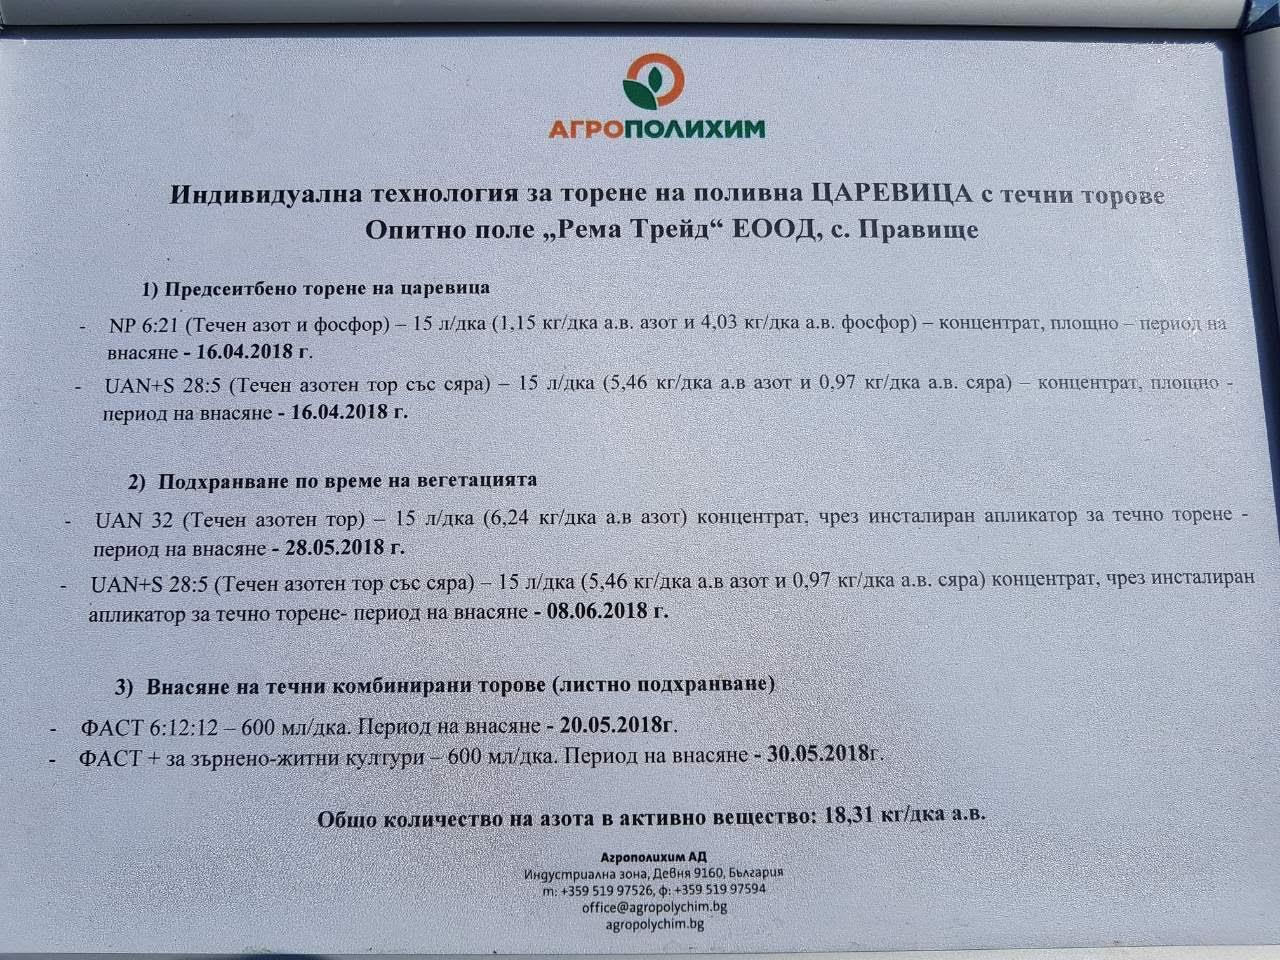 Схема за течно торене на царевица от АГРОПОЛИХИМ